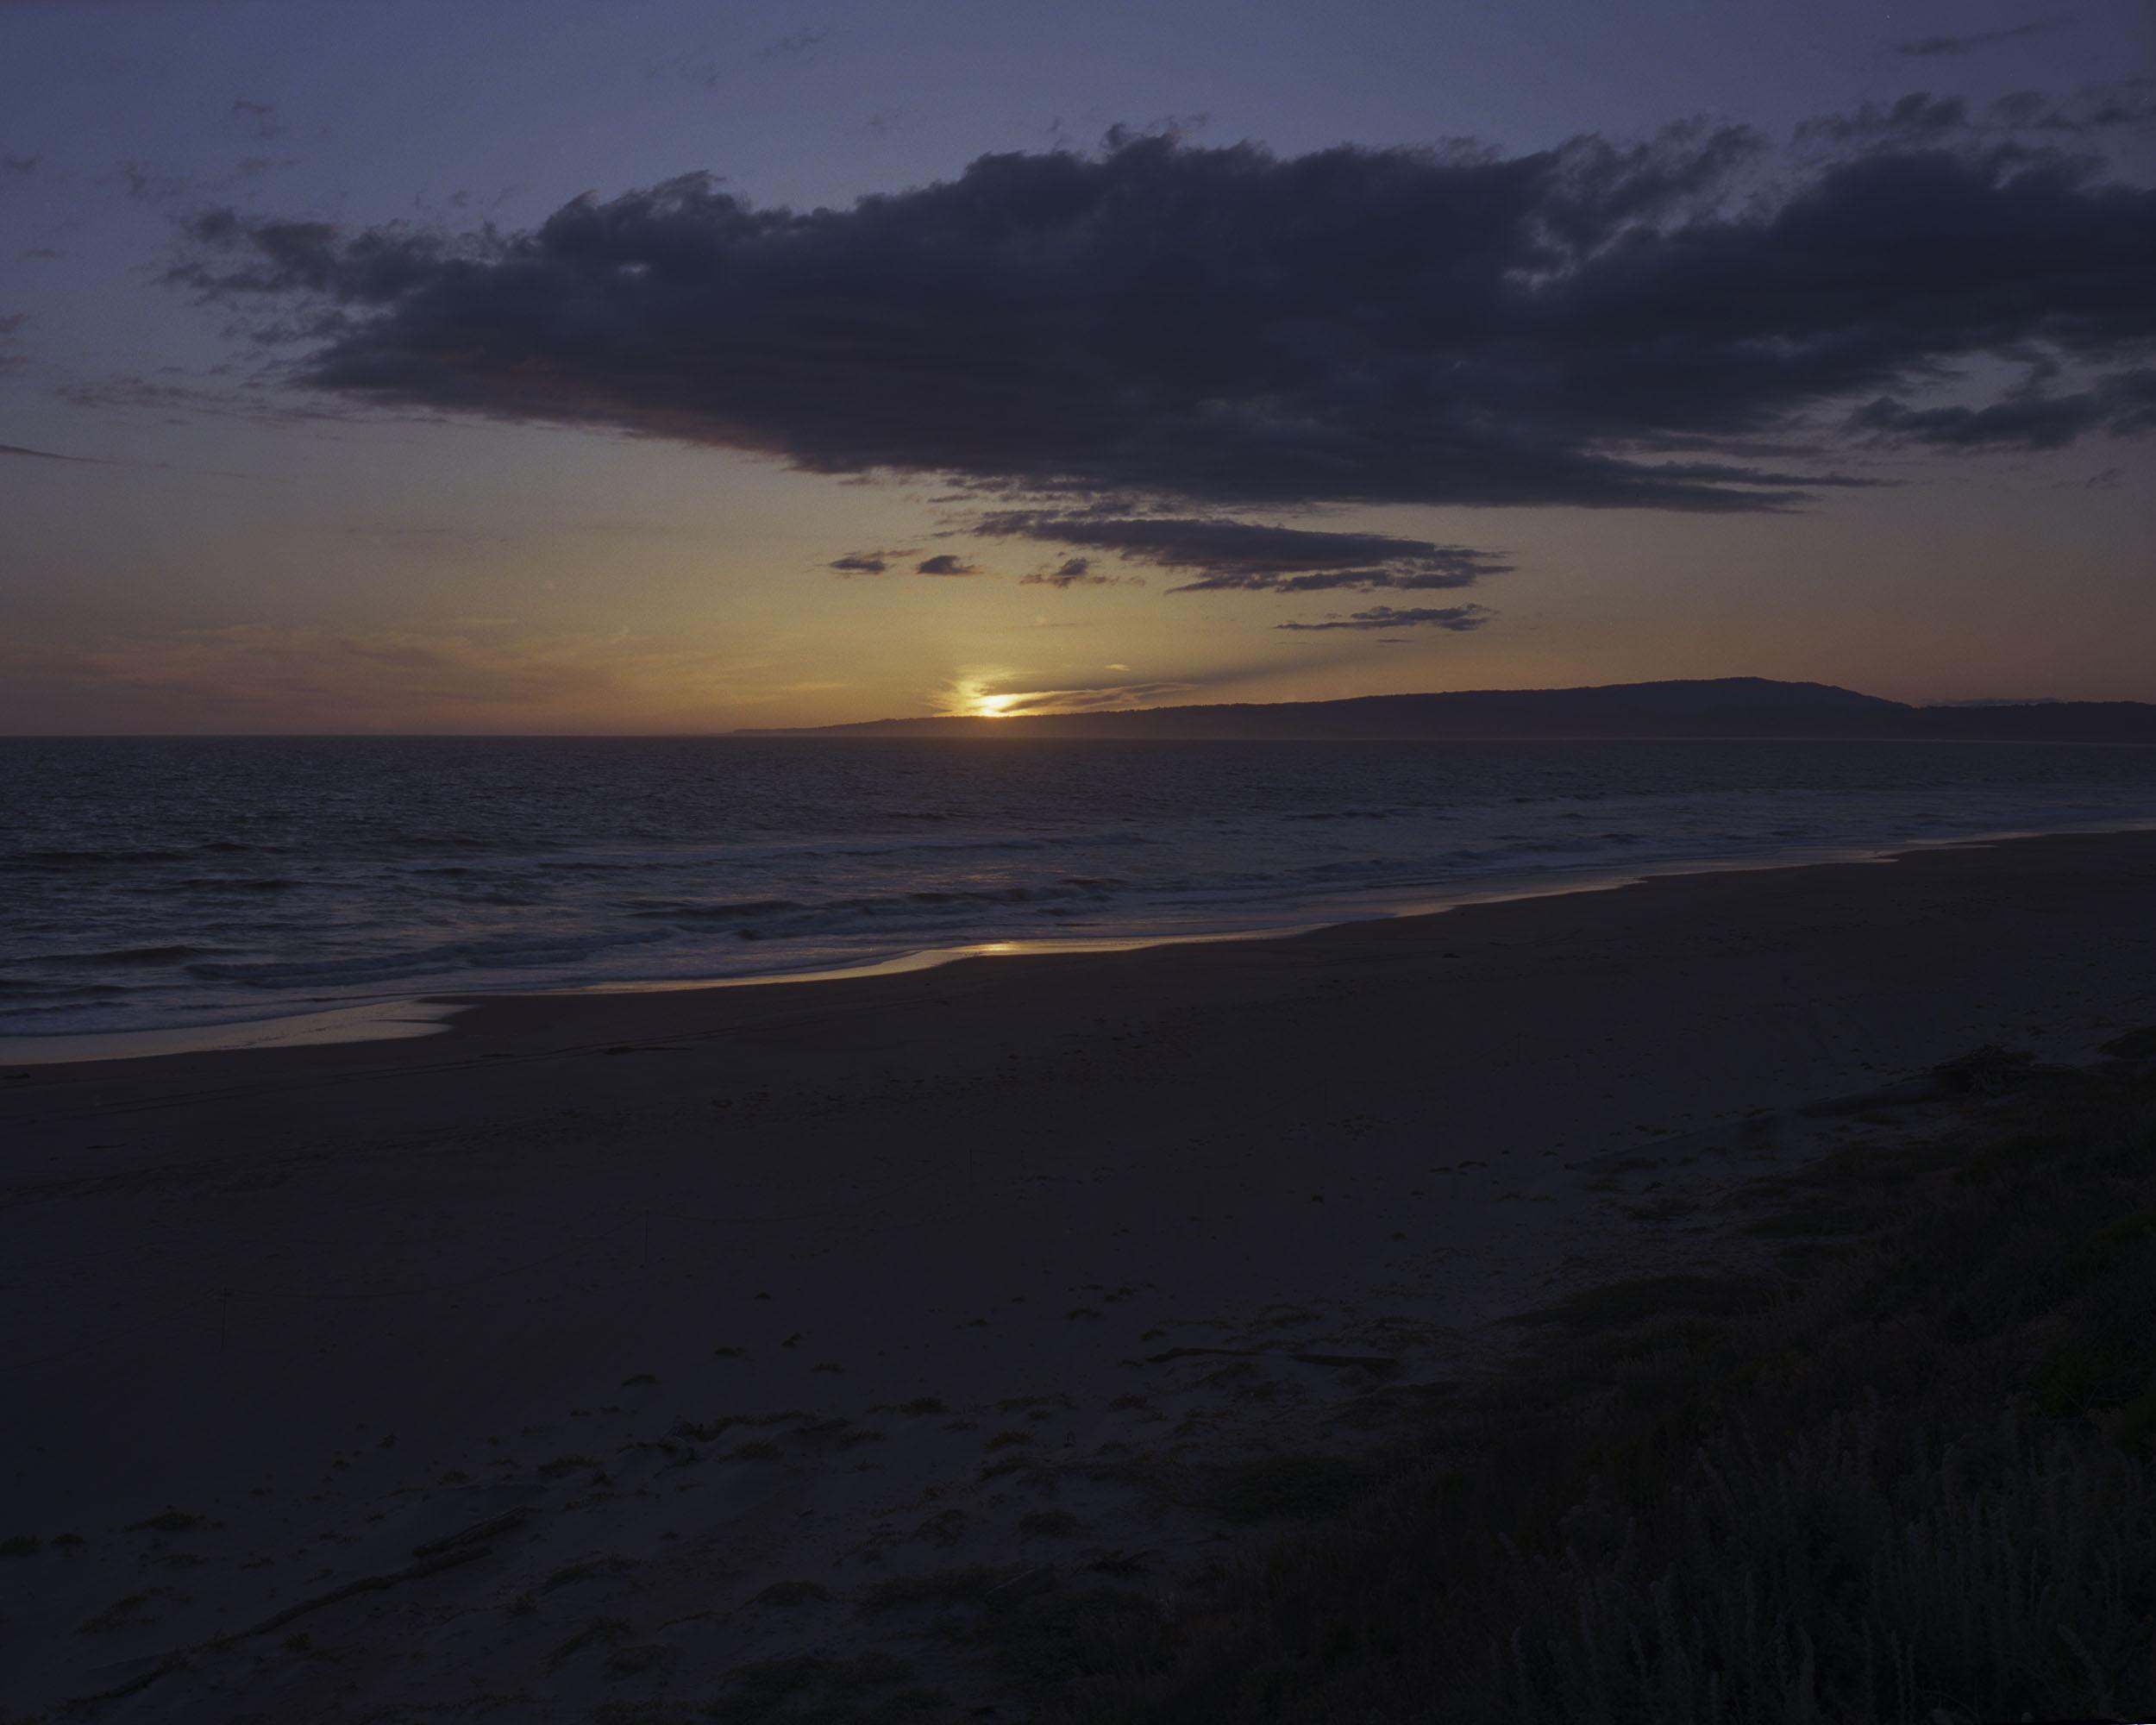 sunset008.jpg